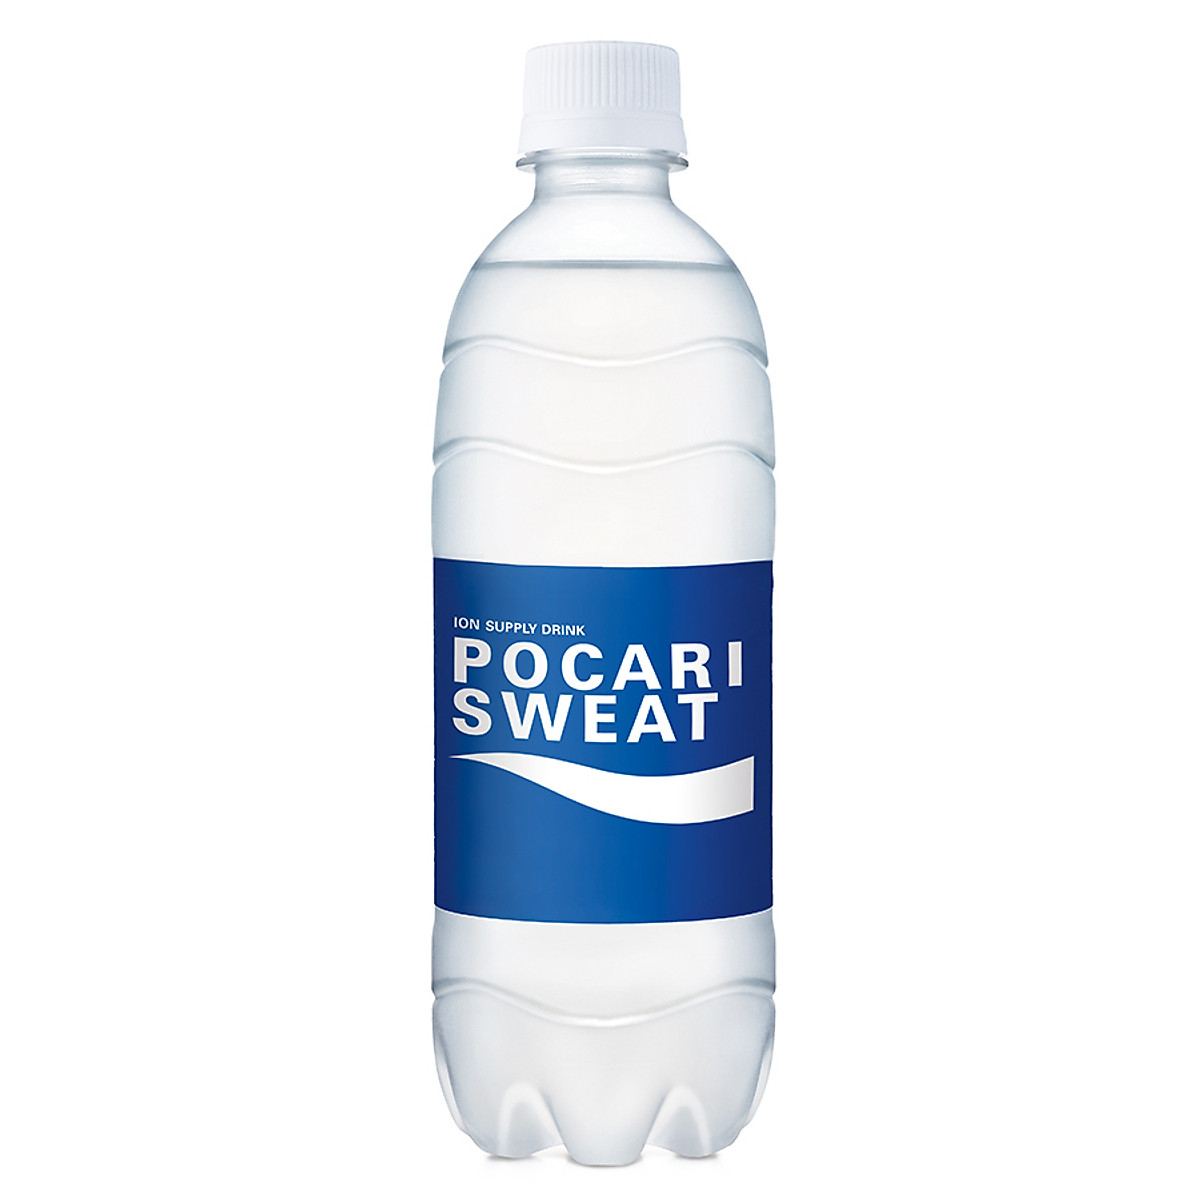 Thức Uống Bổ Sung ION Pocari Sweat (500ml)